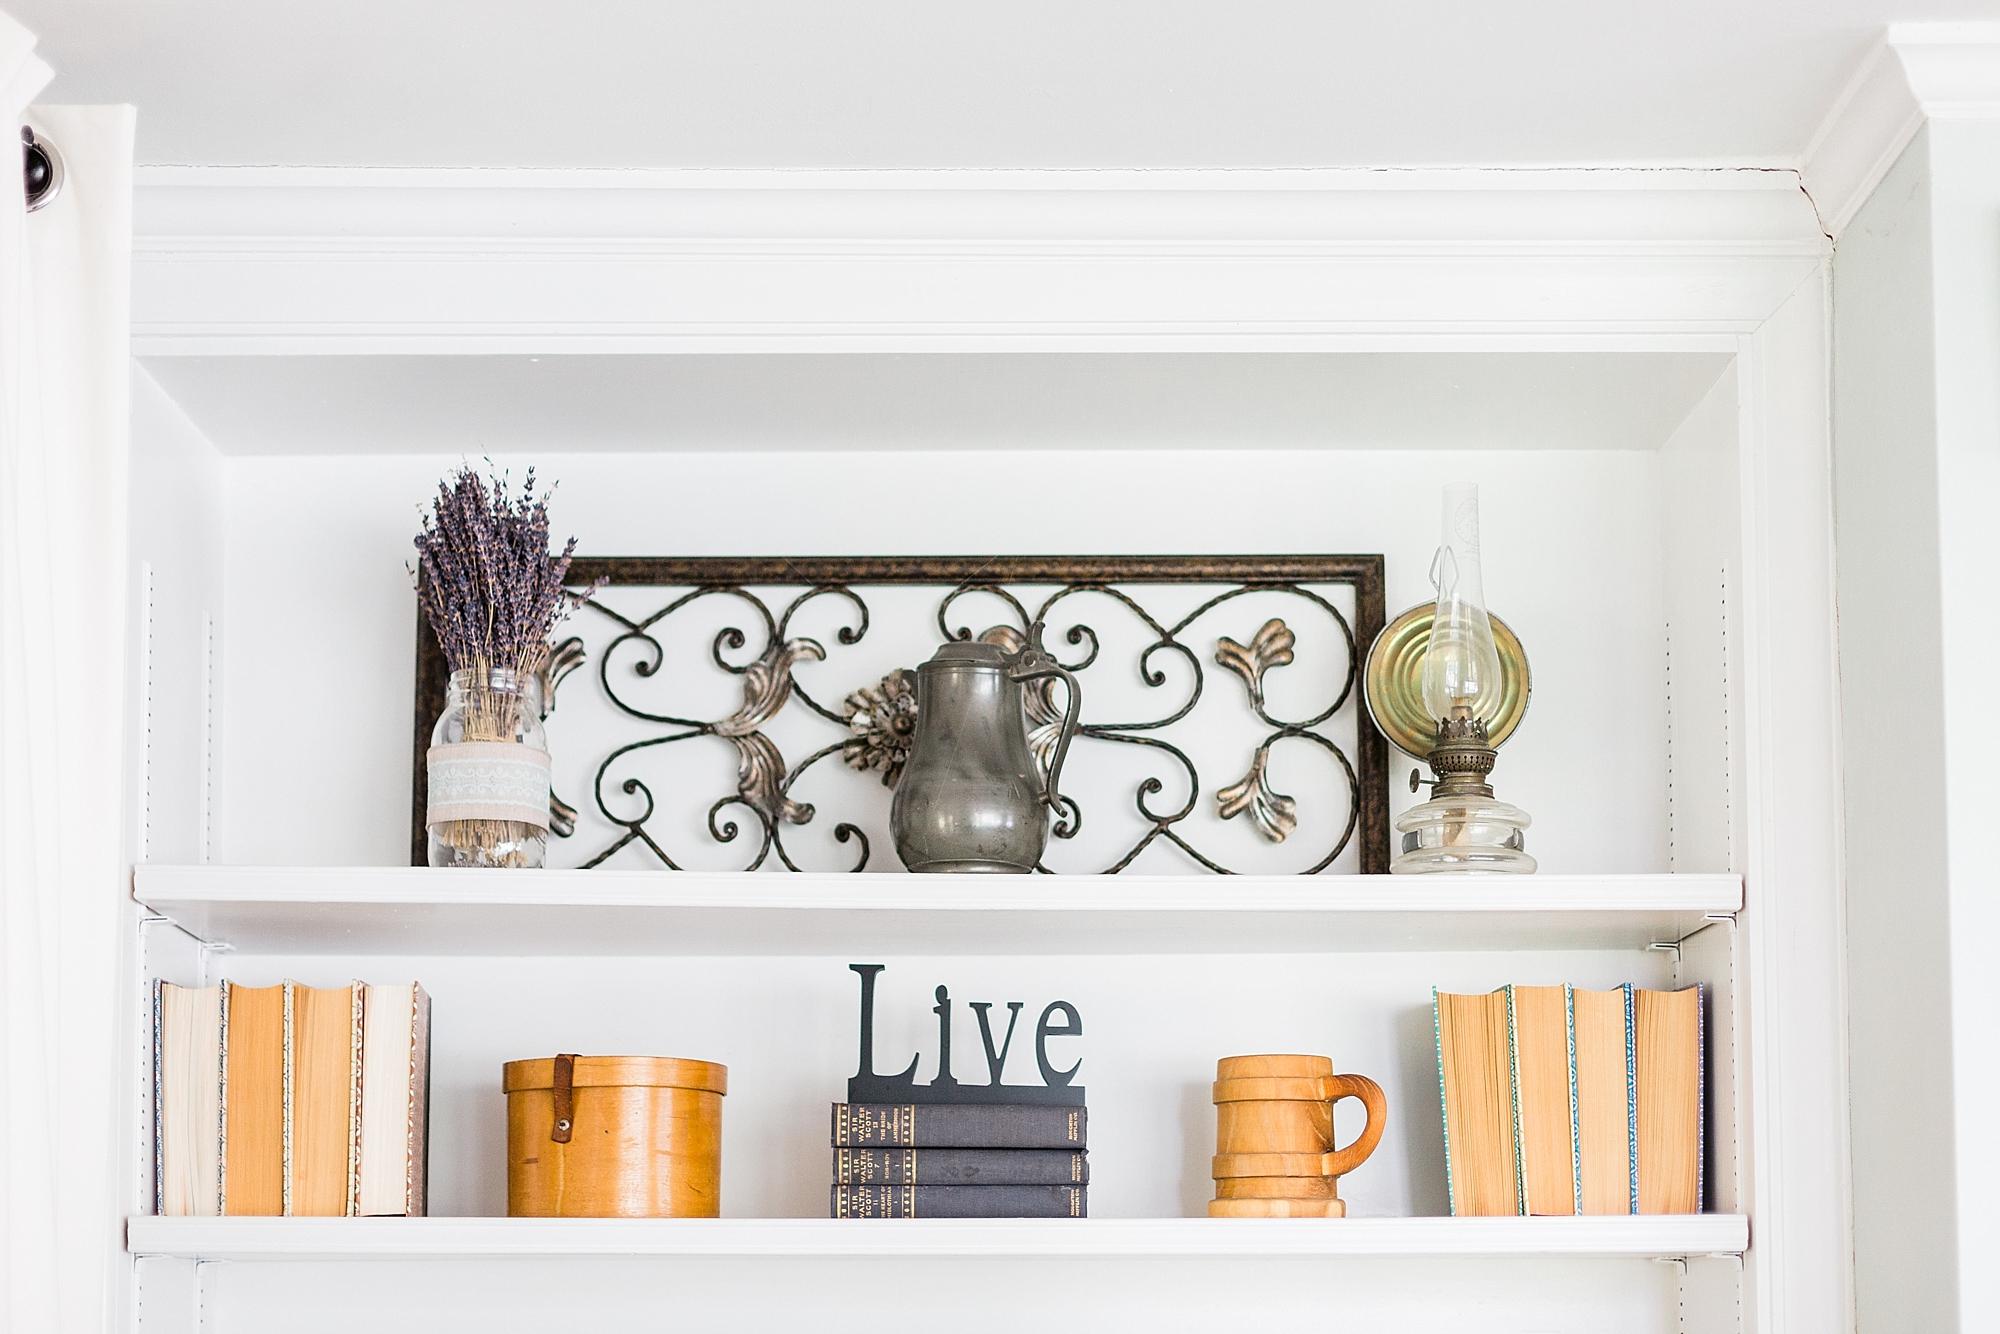 Bookshelf Decor - Lavender - Vintage - New Hampshire Home - Madison Rae Photography